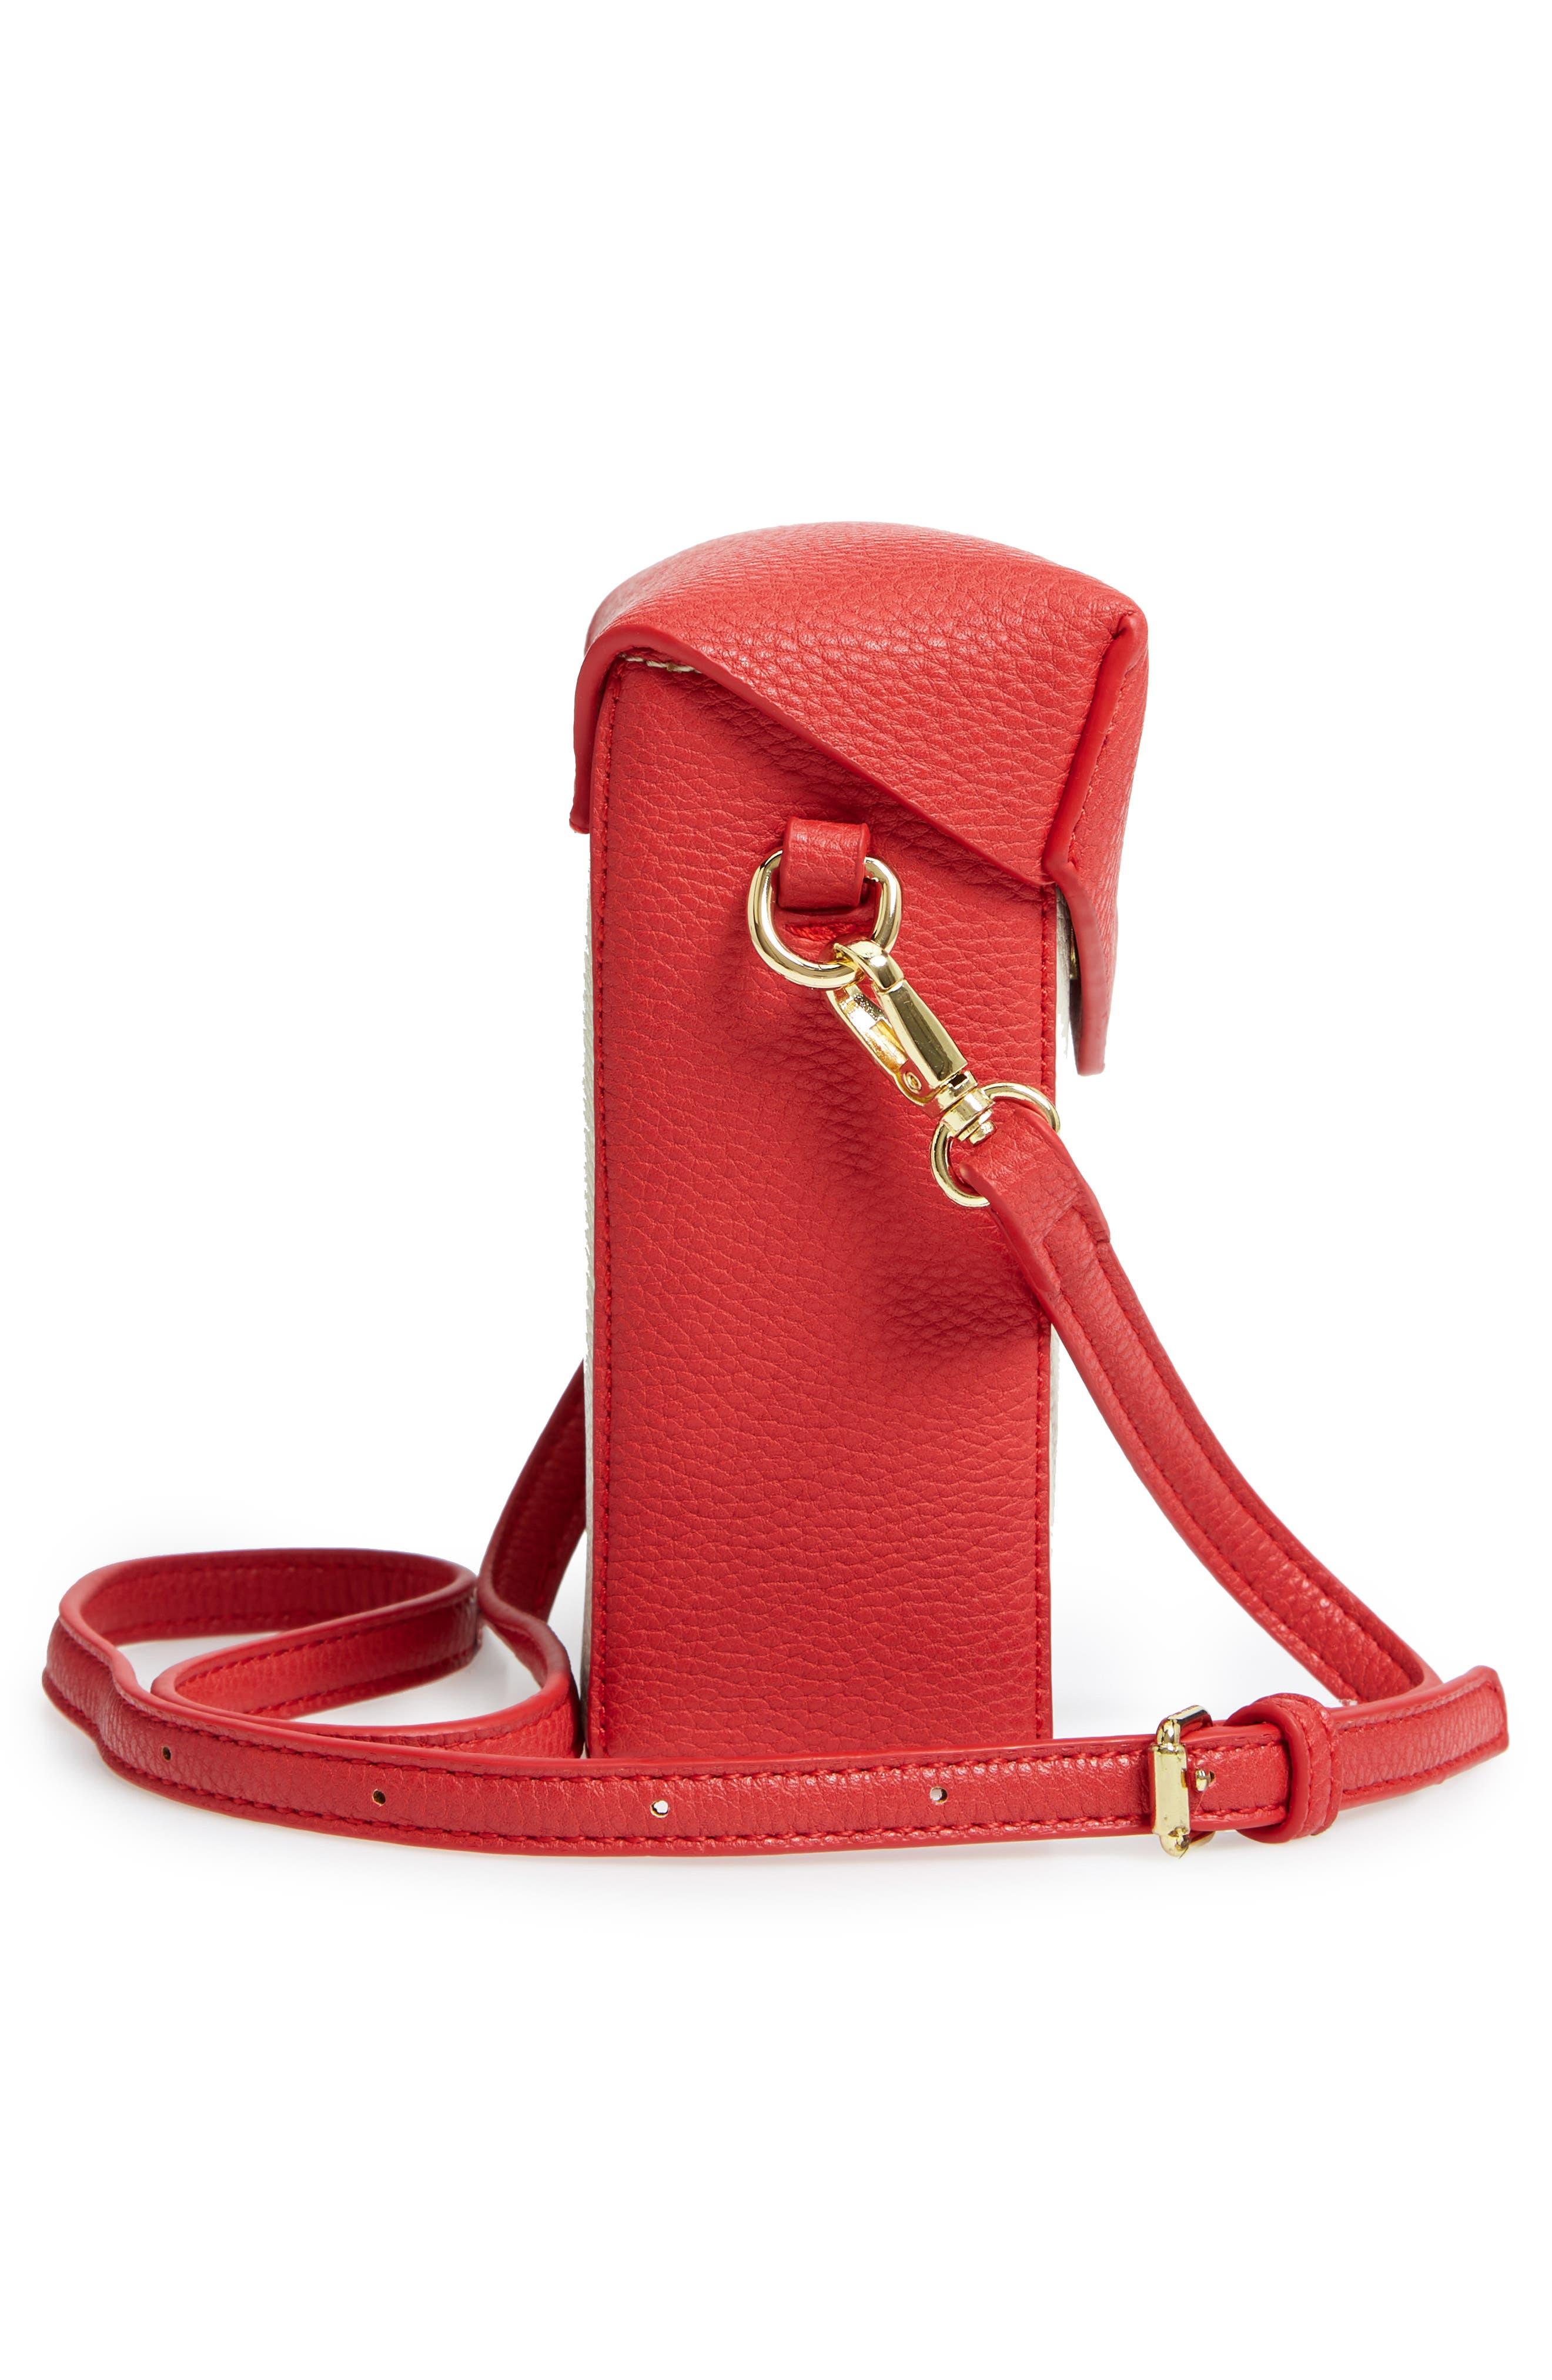 JULES KAE,                             Tabitha Faux Leather Crossbody Bag,                             Alternate thumbnail 5, color,                             100